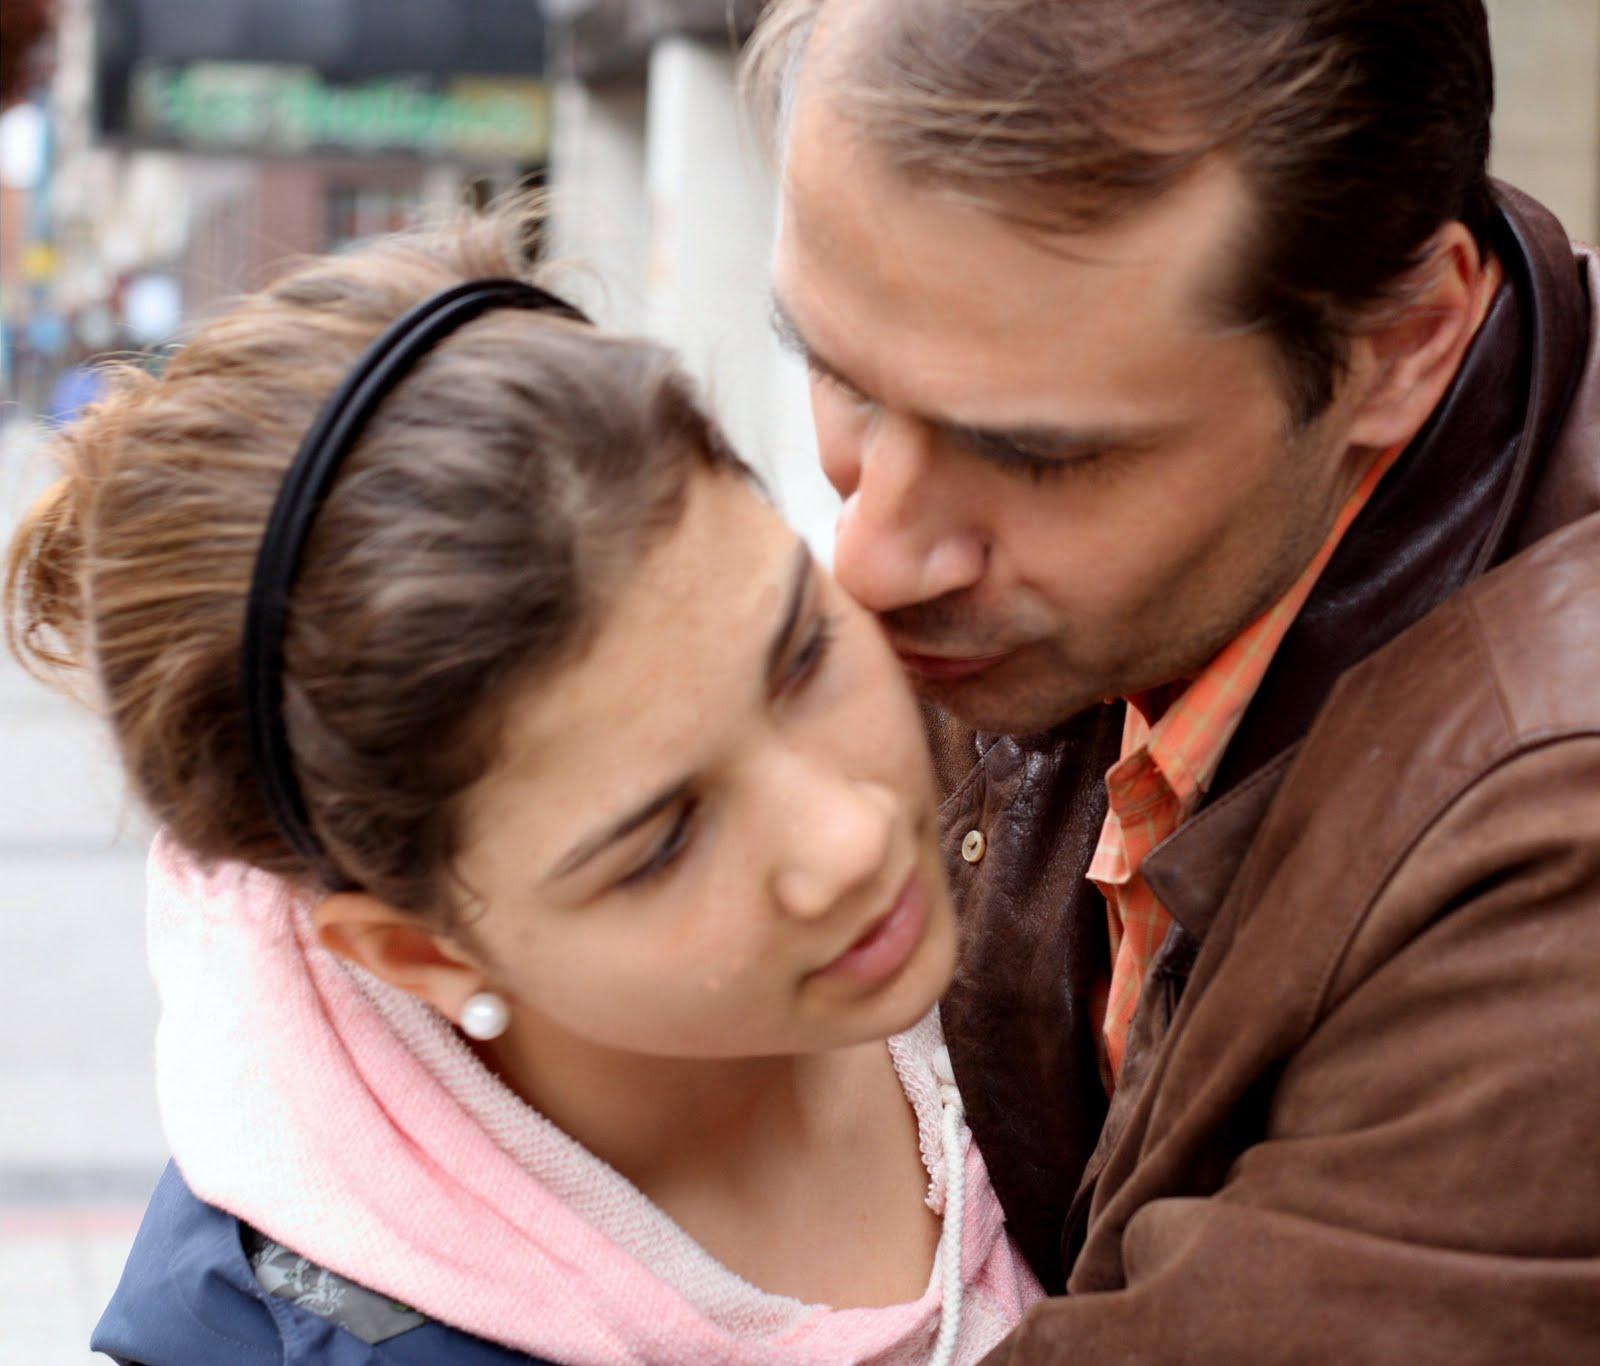 Incesto Padre Y Hija